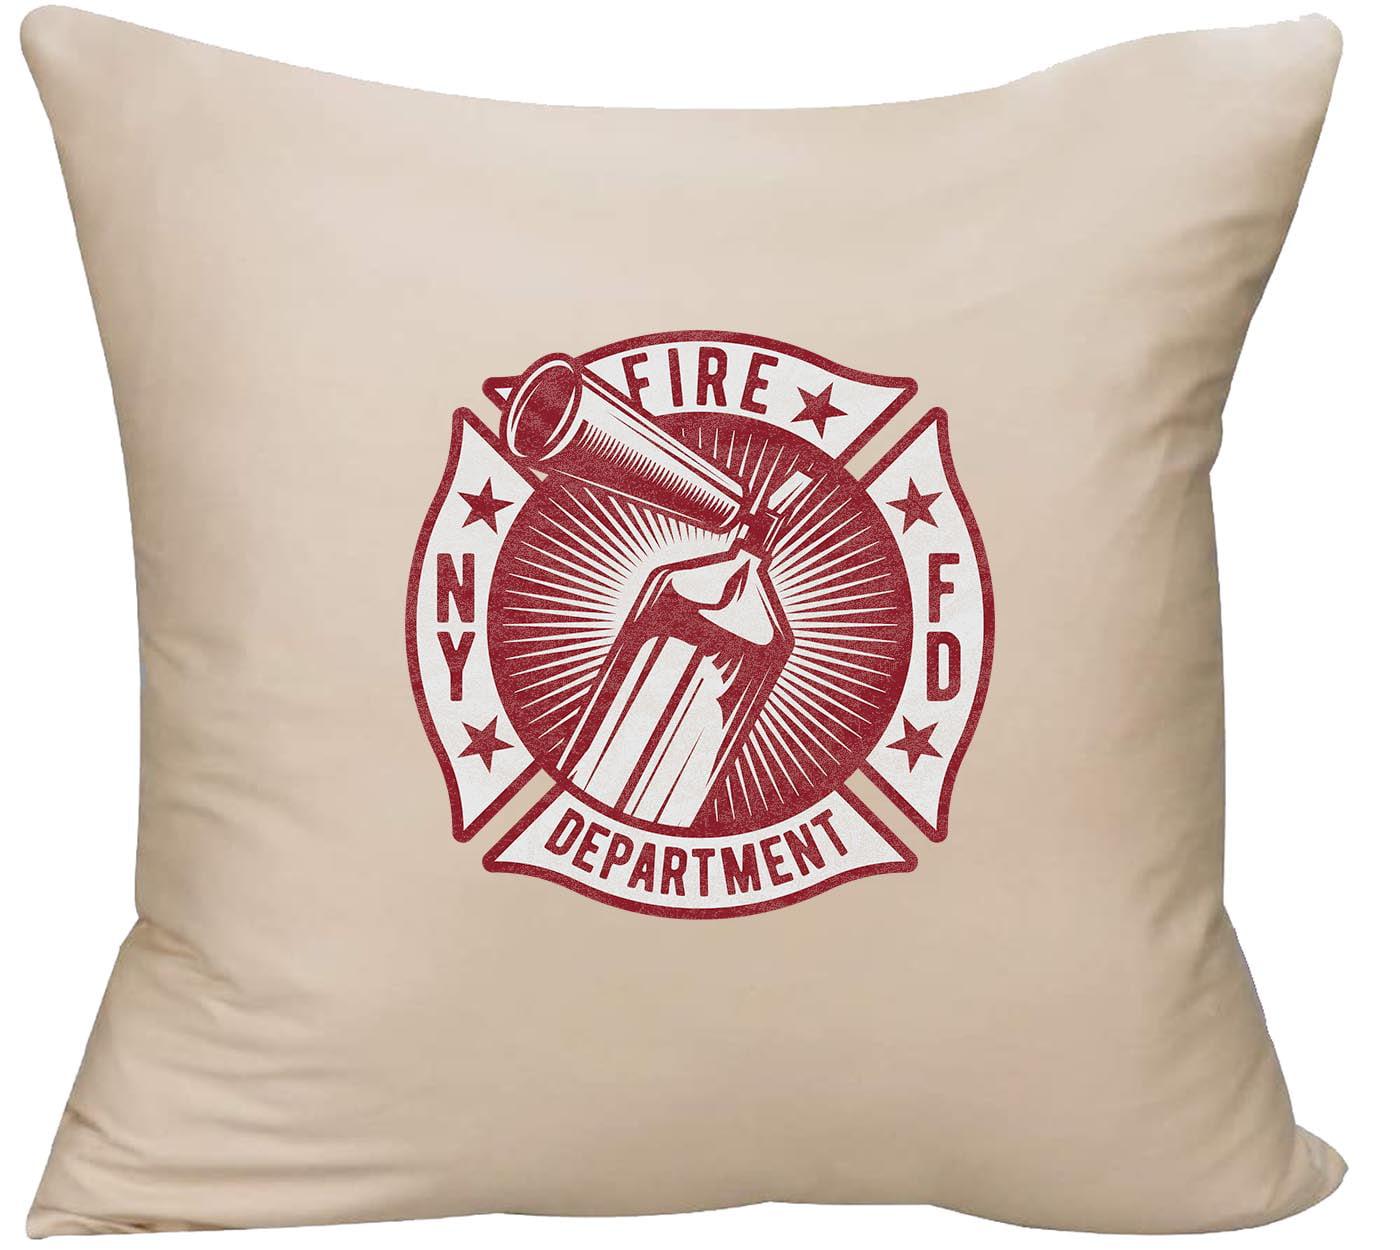 Fire Extinguisher Ny Fire Department New York Decorative Throw Pillow Cover 18 X 18 Beige Funny Gift Walmart Com Walmart Com